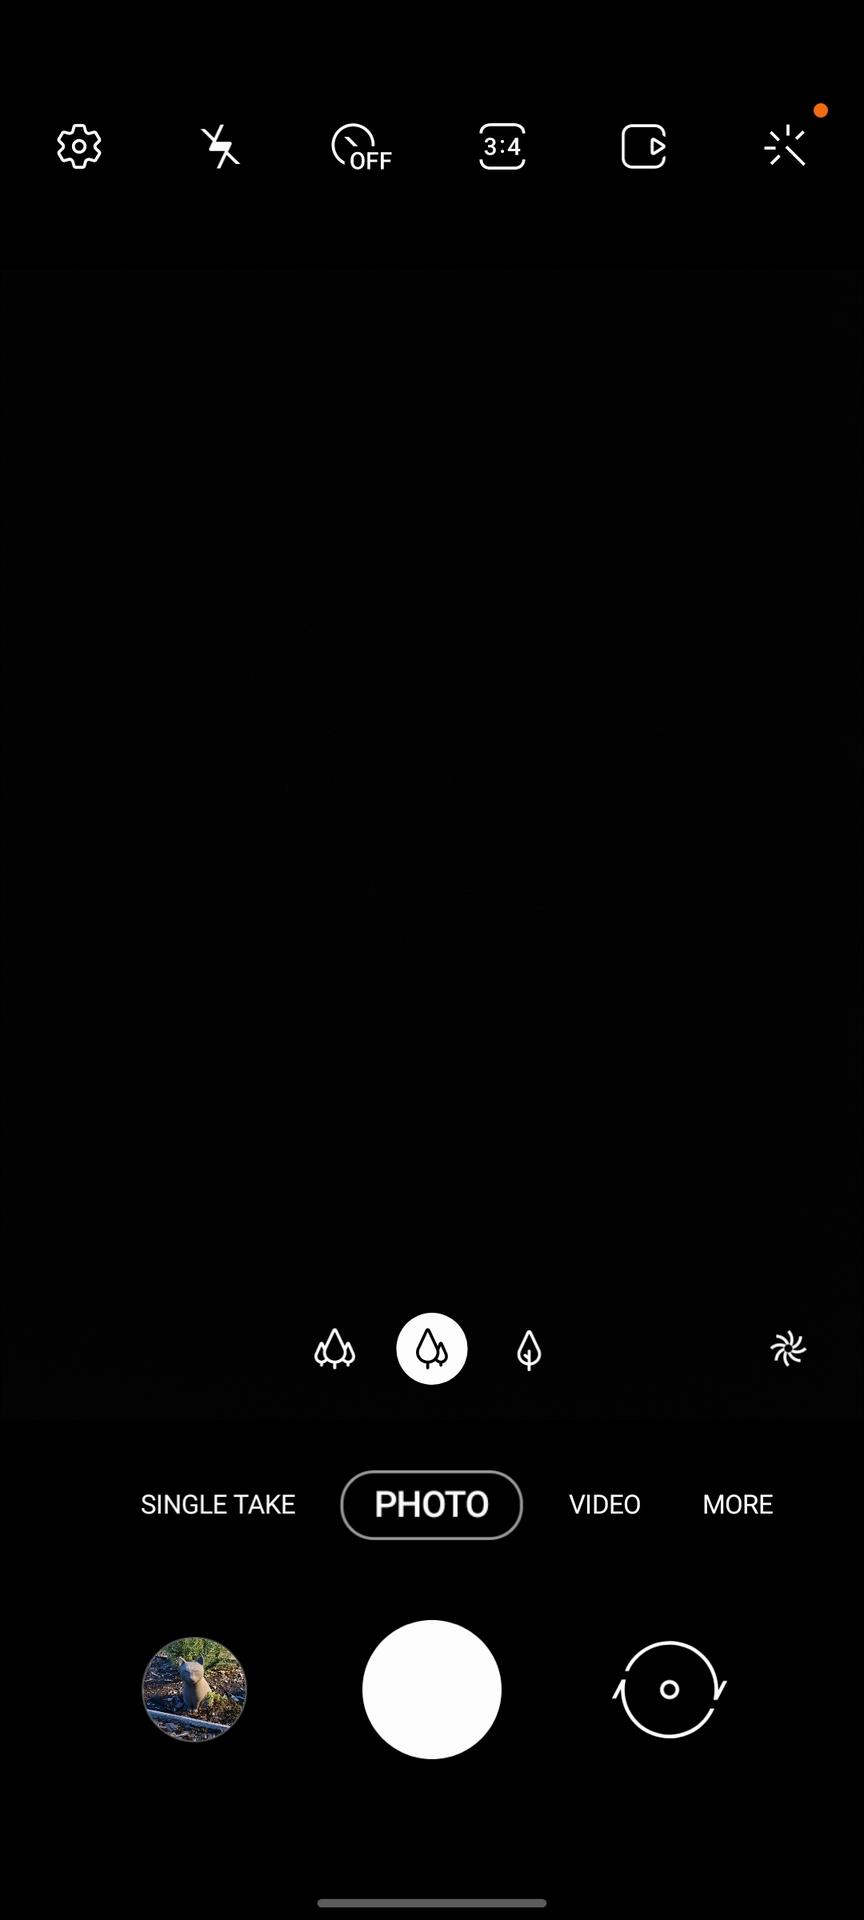 samsung galaxy note 20 screenshot camera app 1